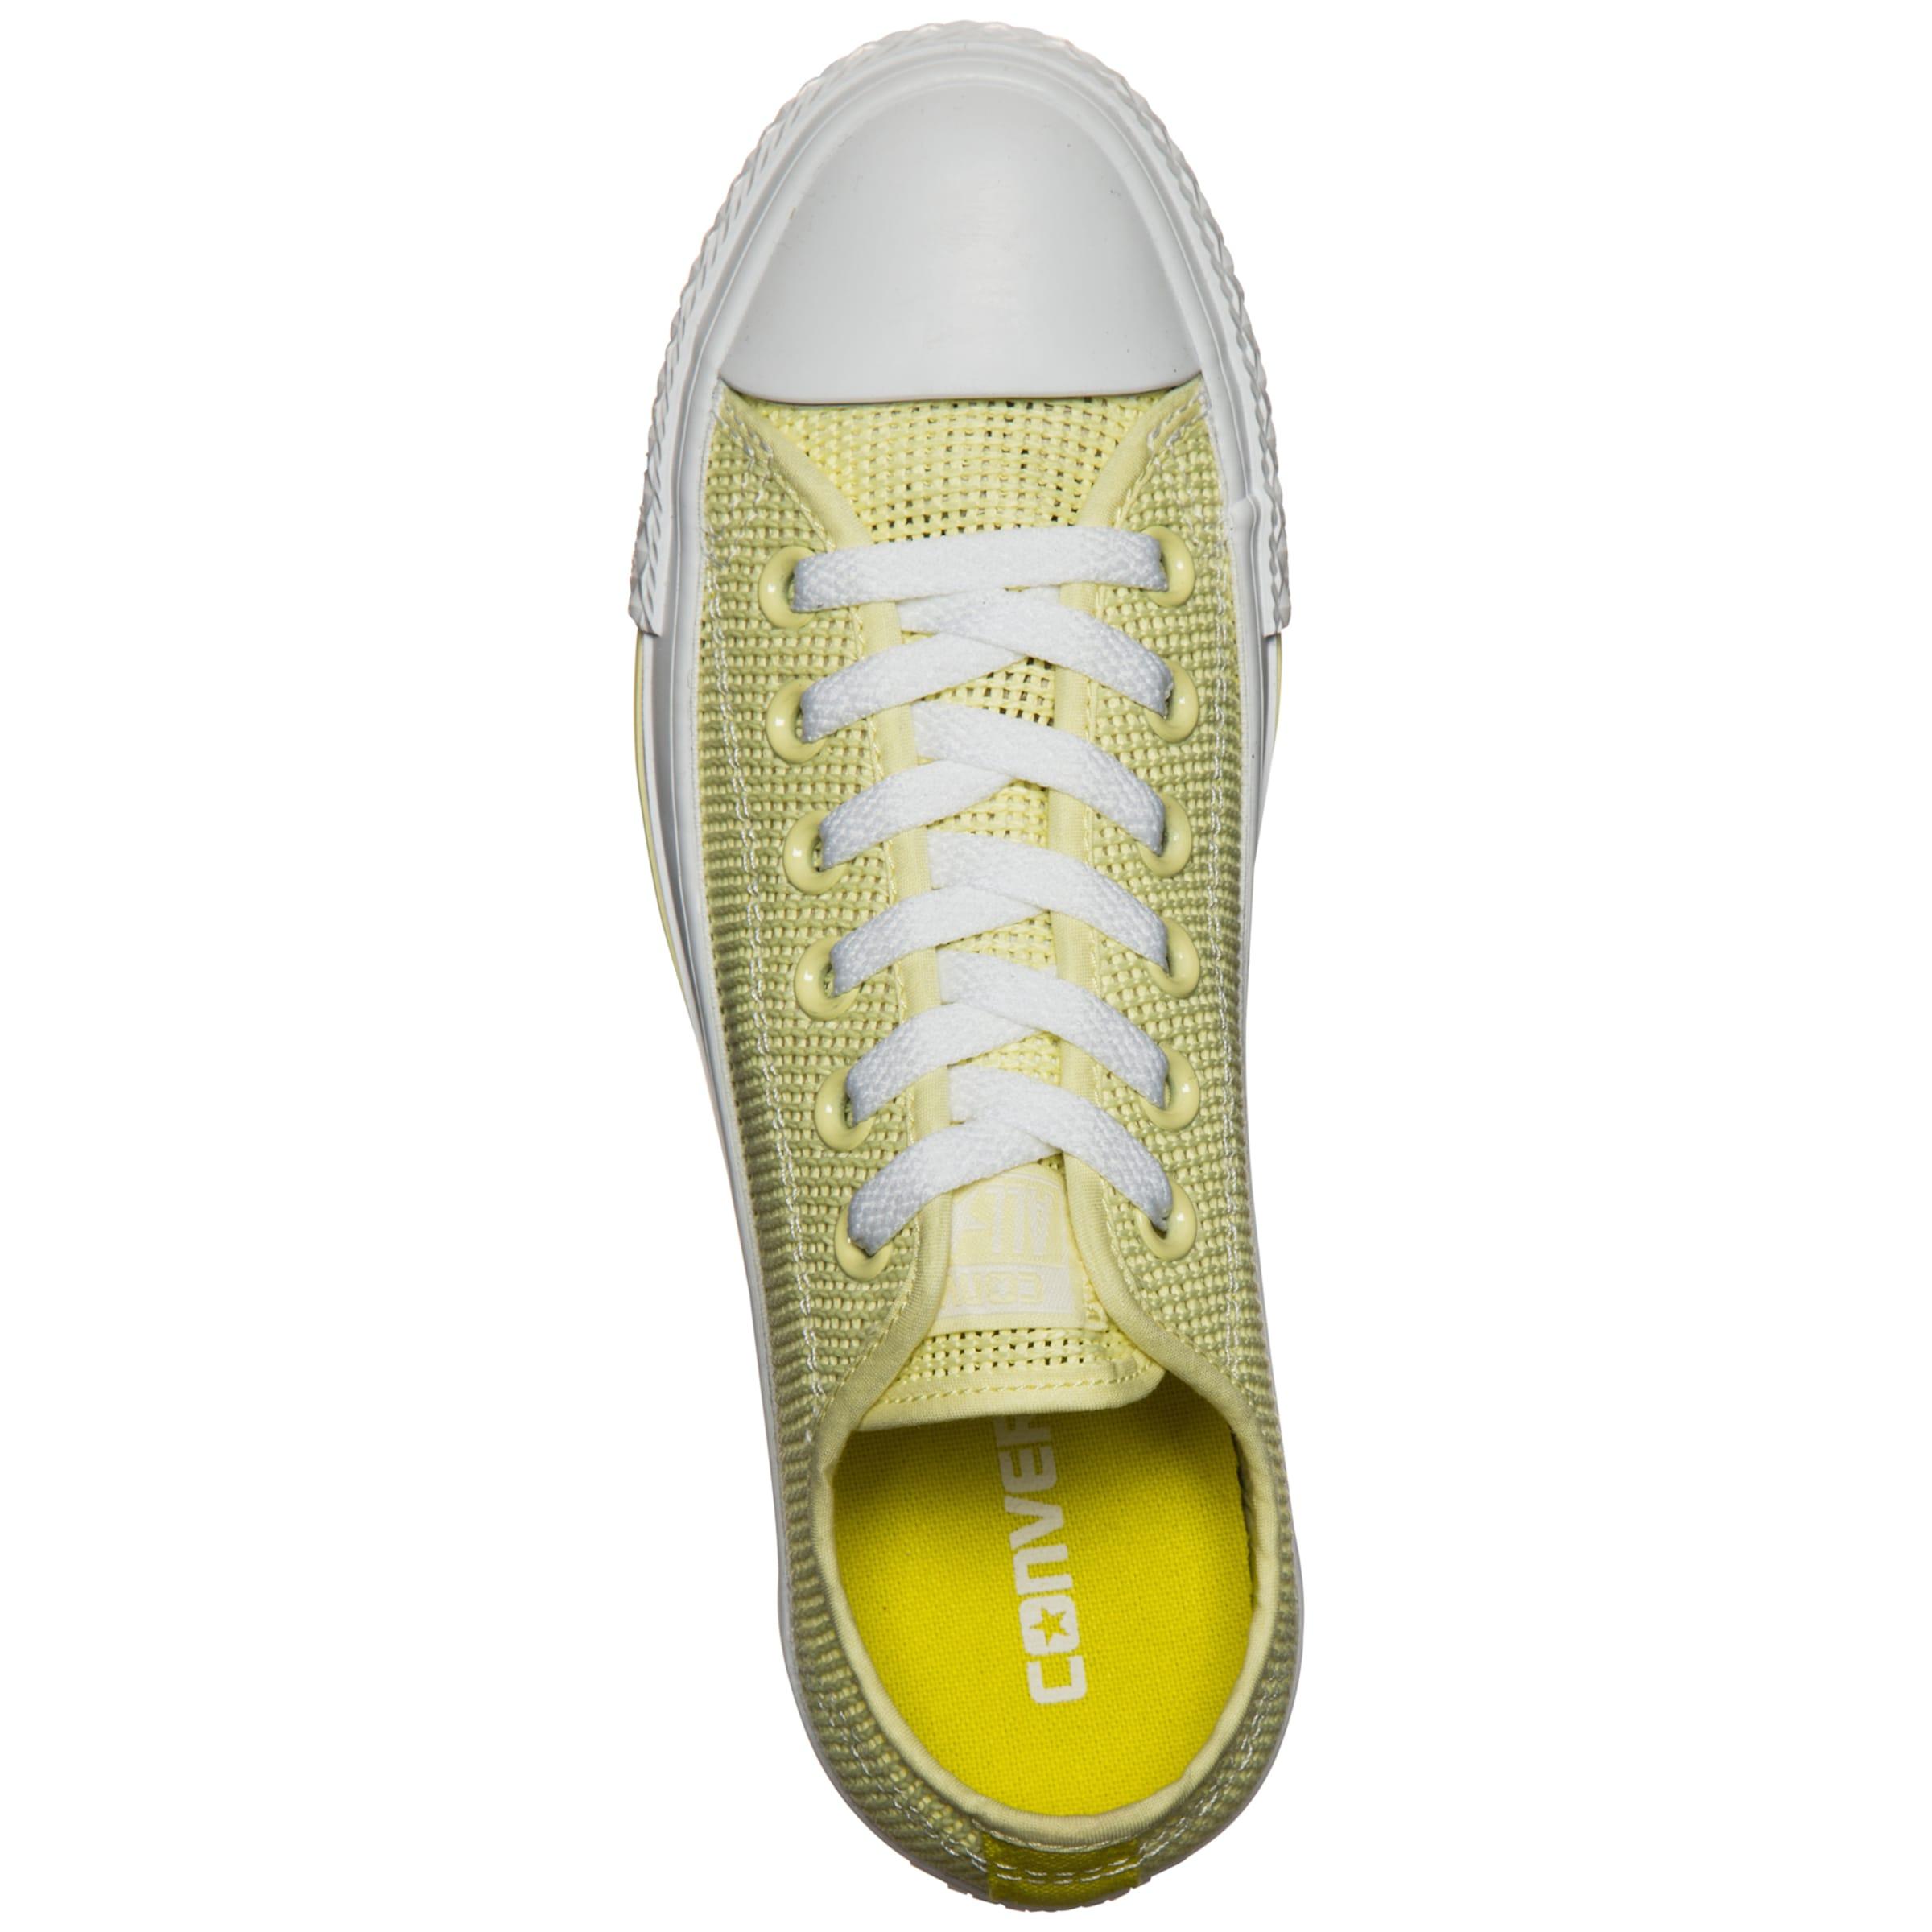 Star All In Taylor 'chuck Converse Ox' Sneaker Gelb Damen 29YeEWDHI